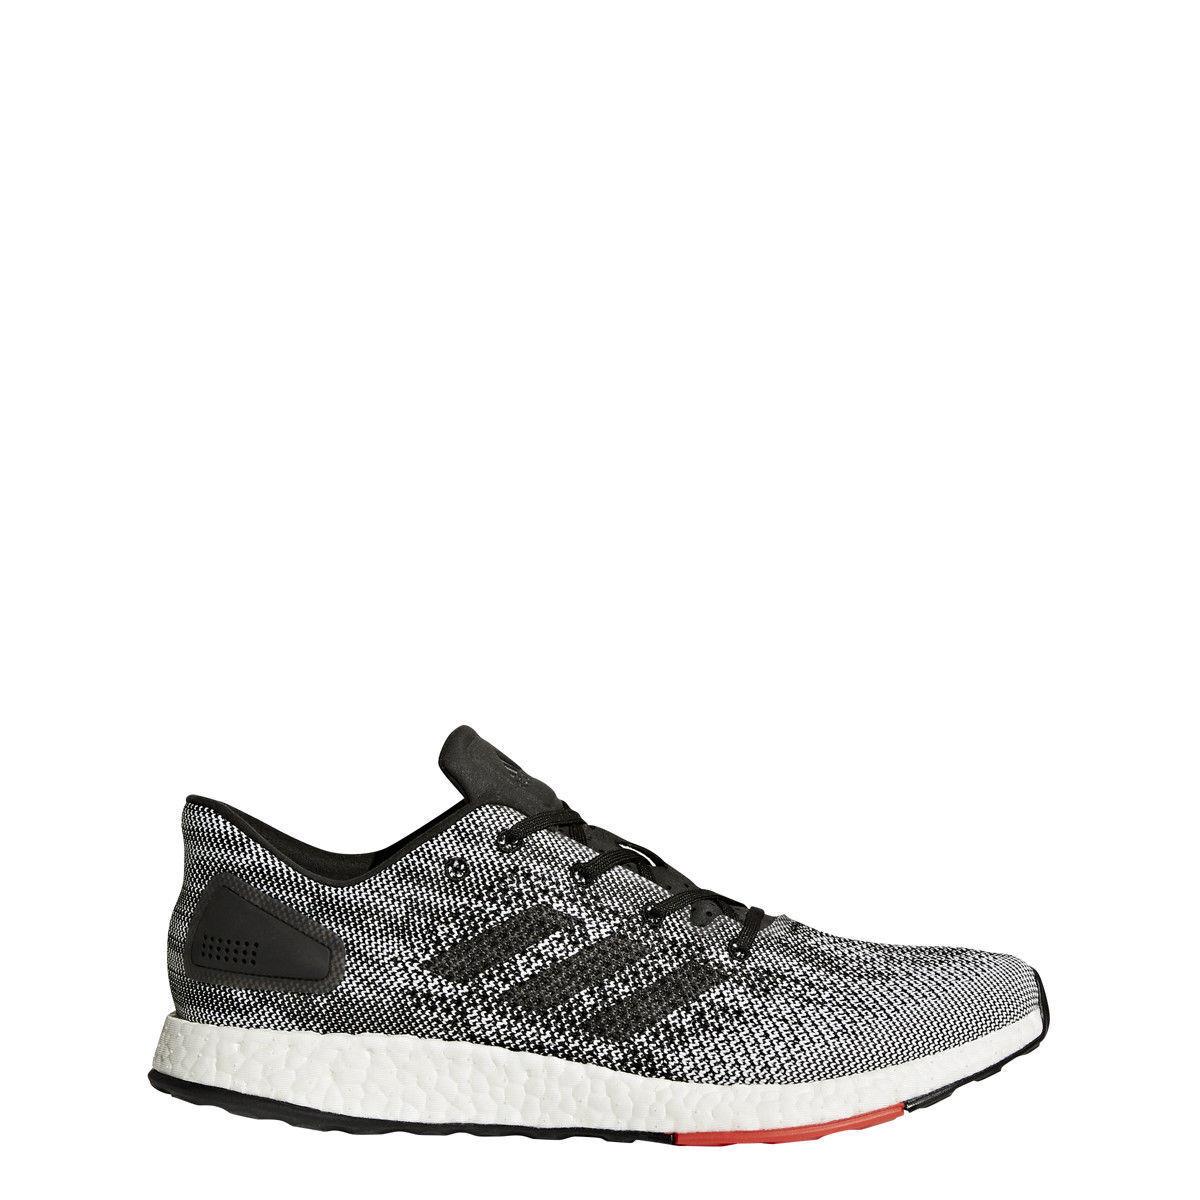 Adidas MENS PUREBOOST DPR BLACK BLACK WHITE - S80993